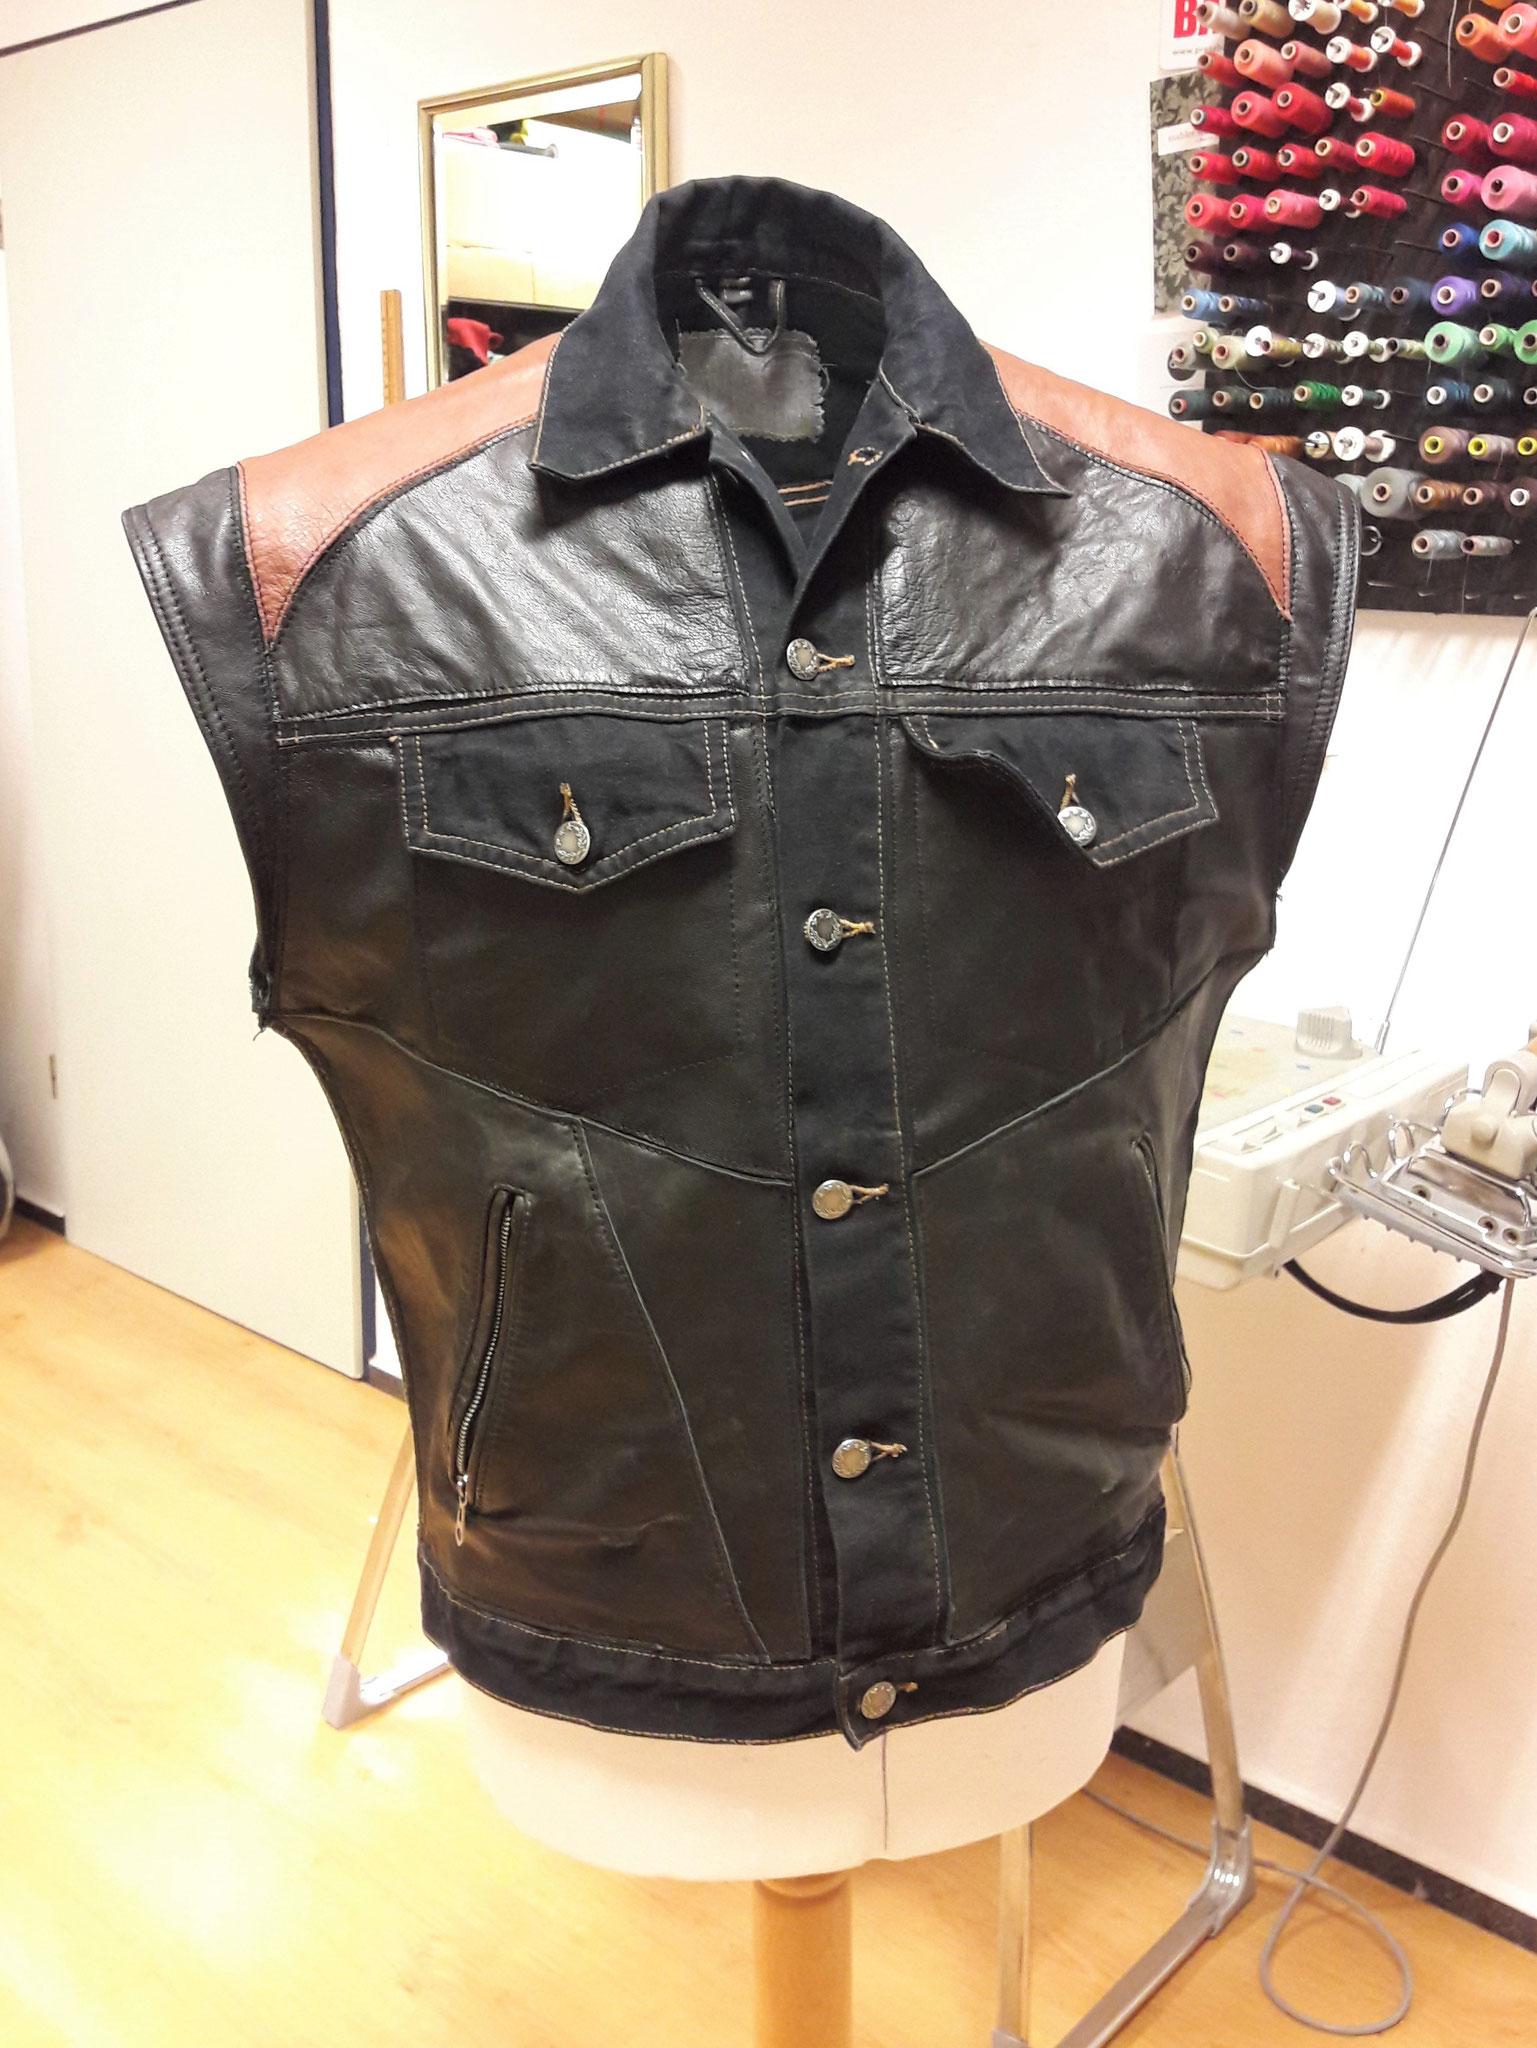 Kutte aus Jeans bestückt mit alter Lederjacke